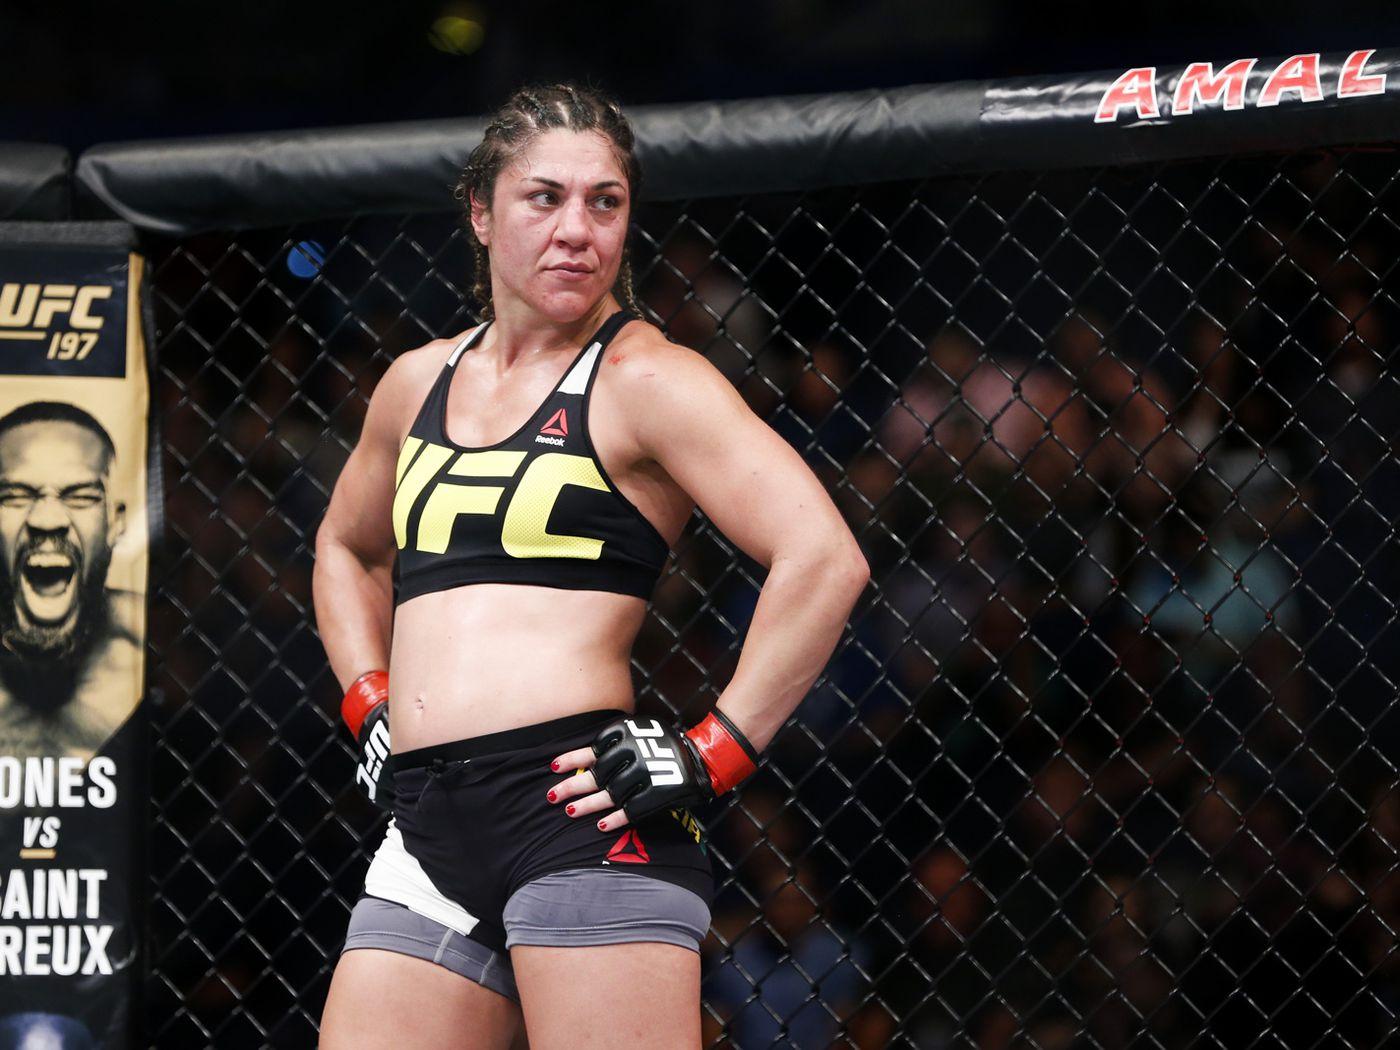 Former title contender Bethe Correia